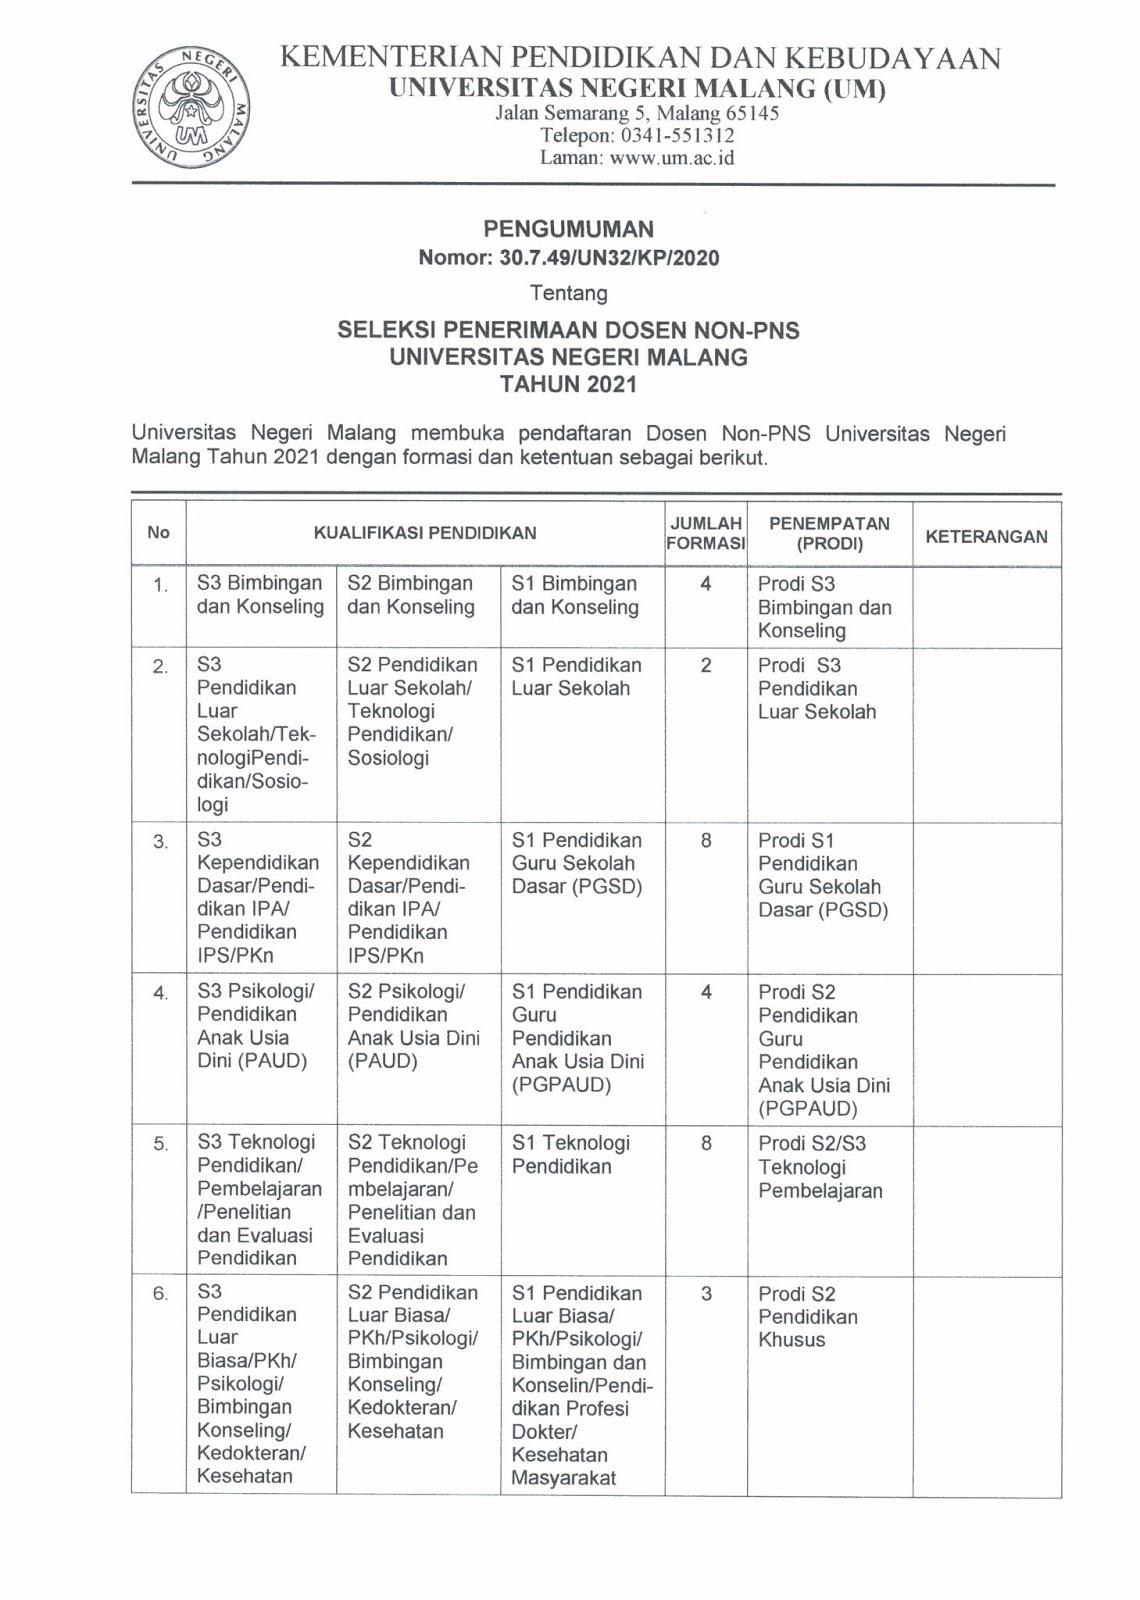 Seleksi Penerimaan Dosen Non PNS Universitas Negeri Malang